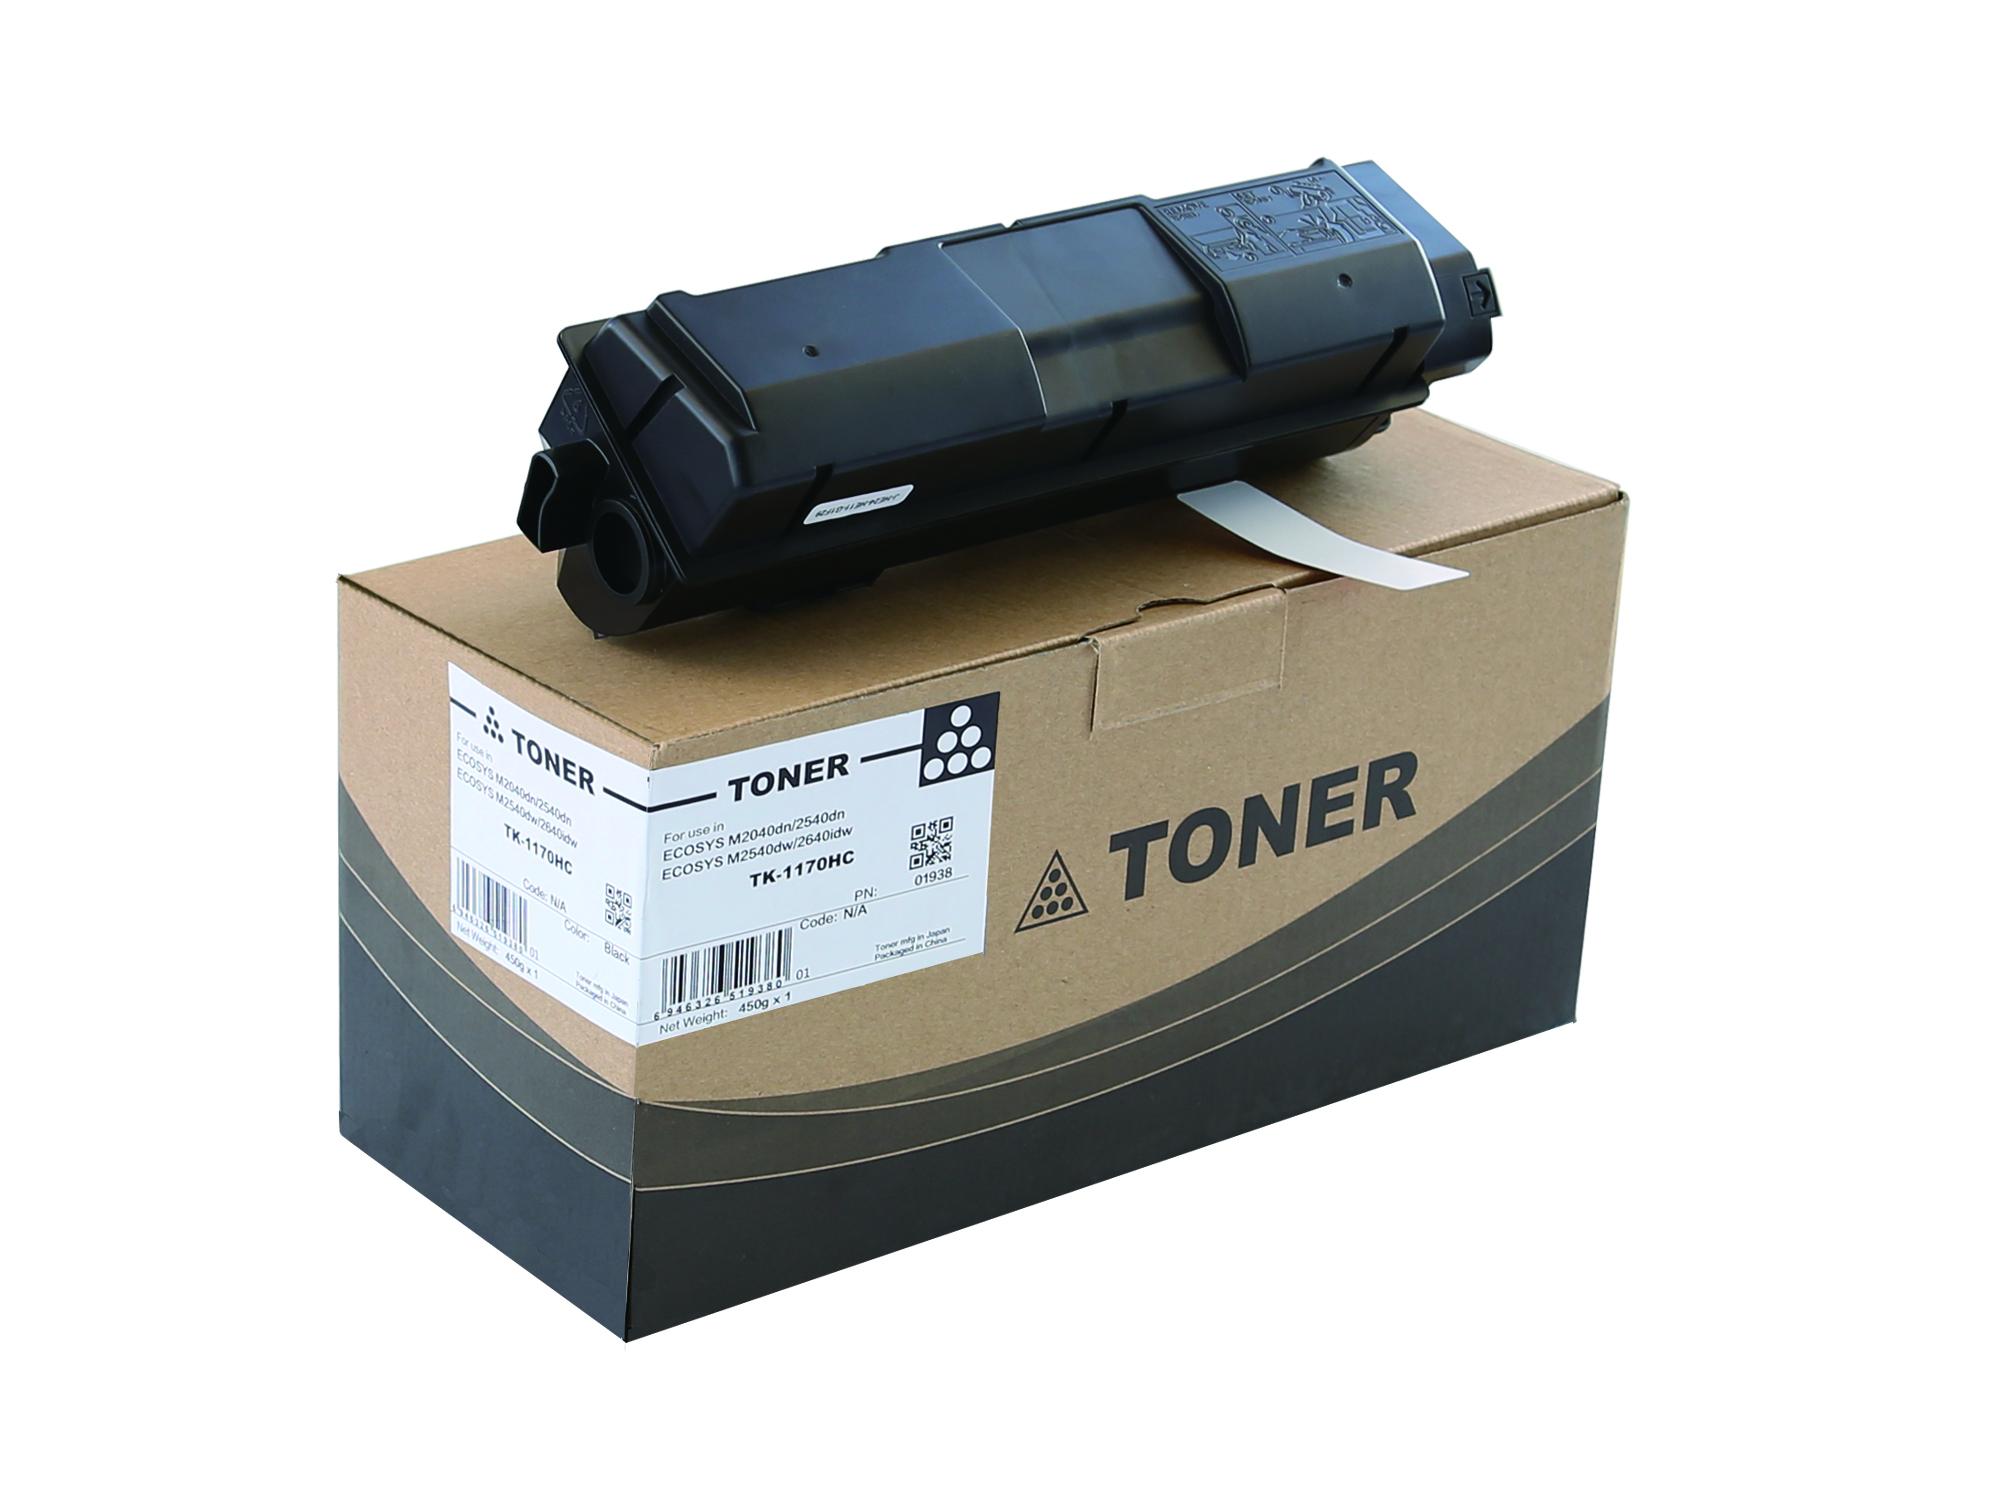 TK-1170HC Toner Cartridge for Kyocera ECOSYS M2040dn